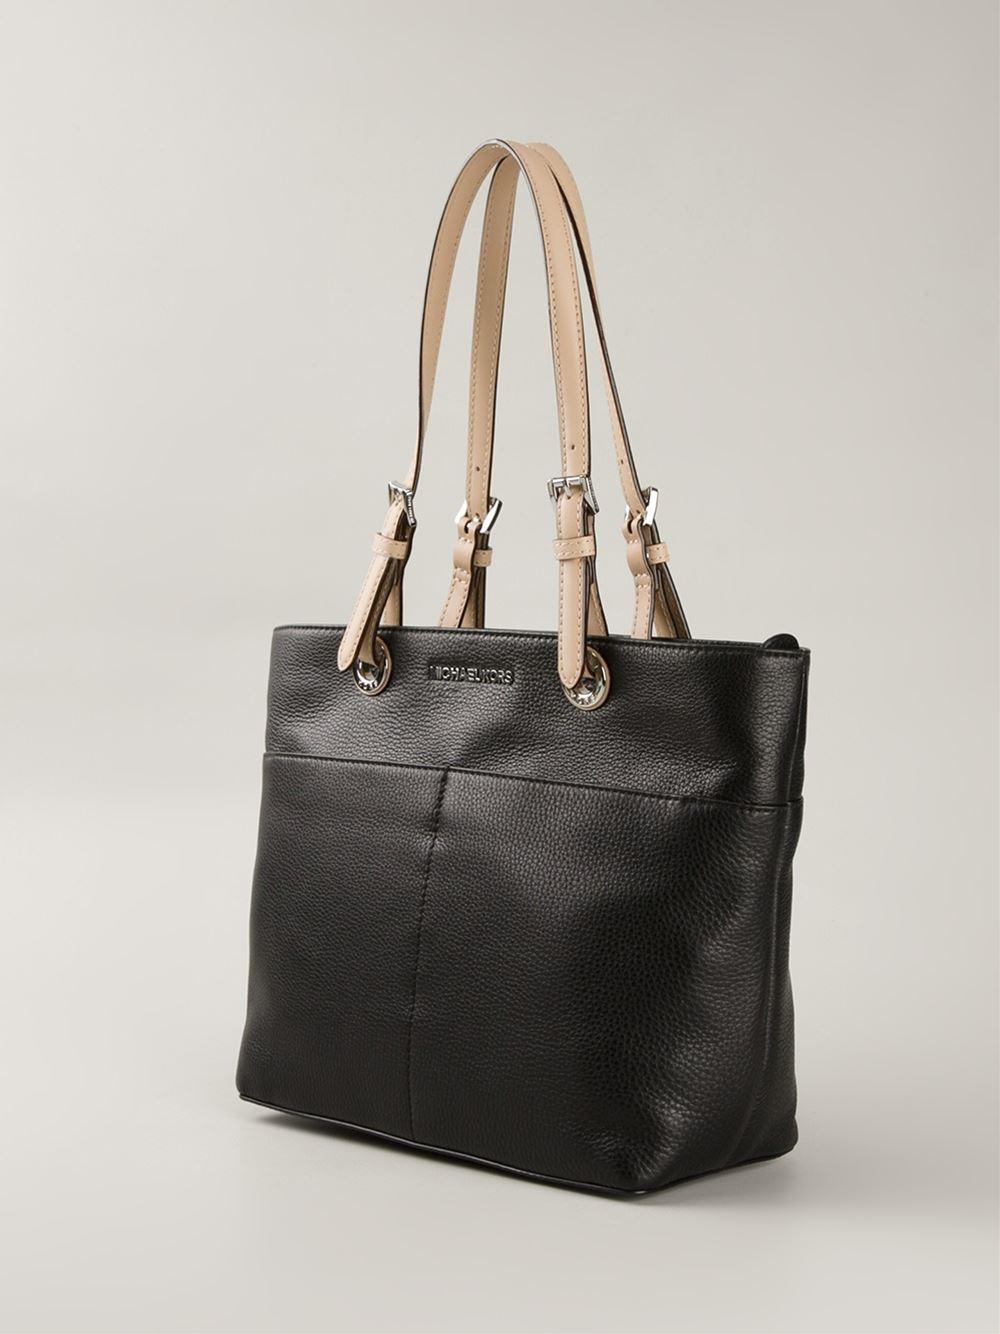 901ab7ac5fa5 MICHAEL Michael Kors 'bedford' Tote Bag in Black - Lyst